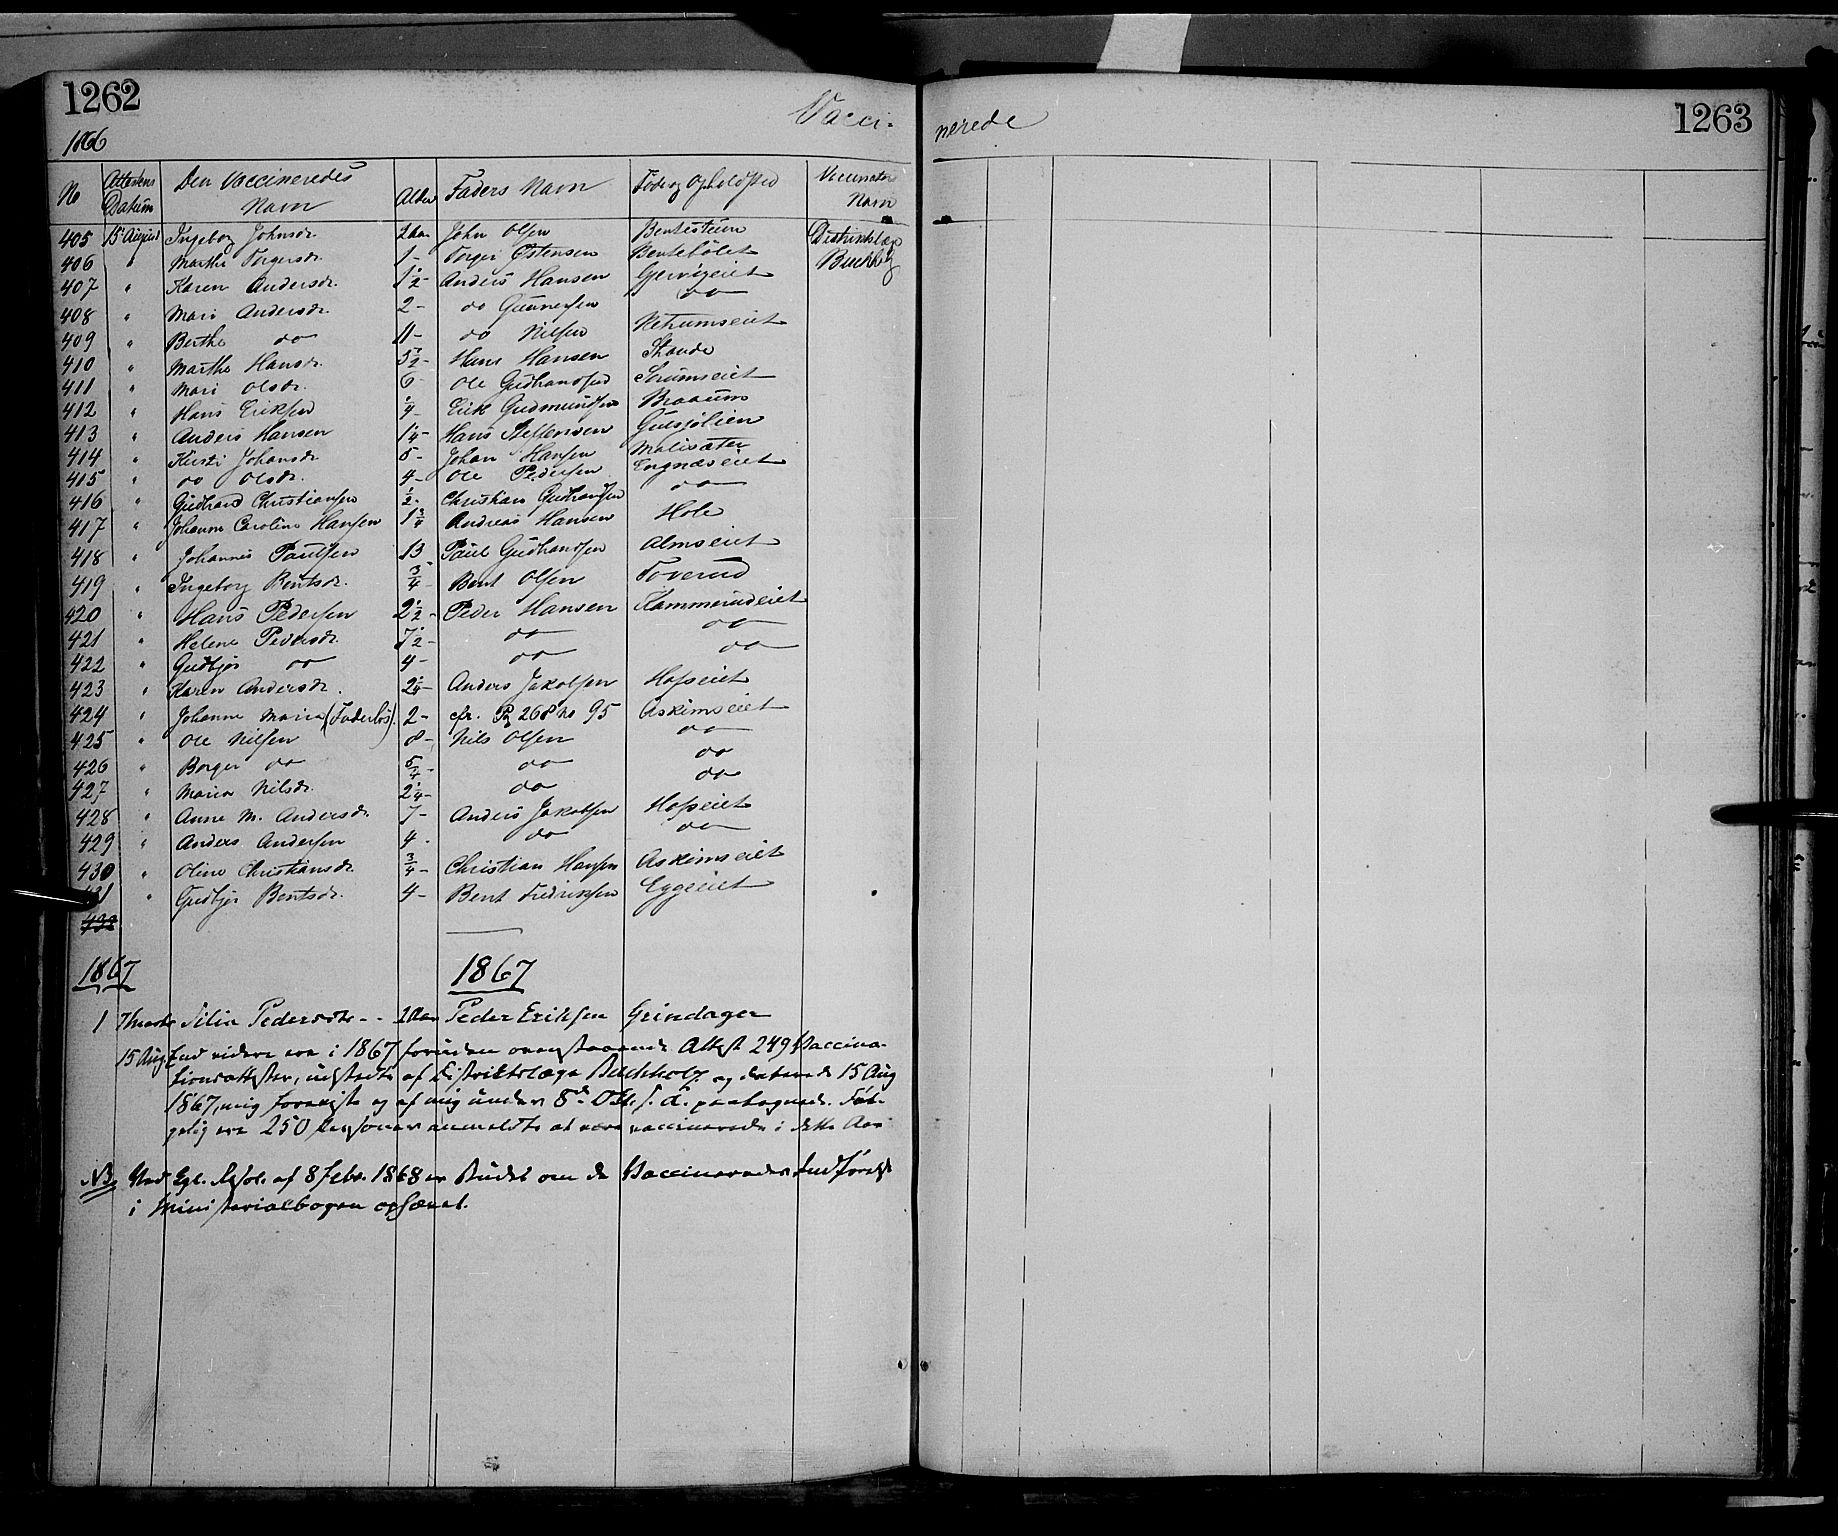 SAH, Gran prestekontor, Ministerialbok nr. 12, 1856-1874, s. 1262-1263